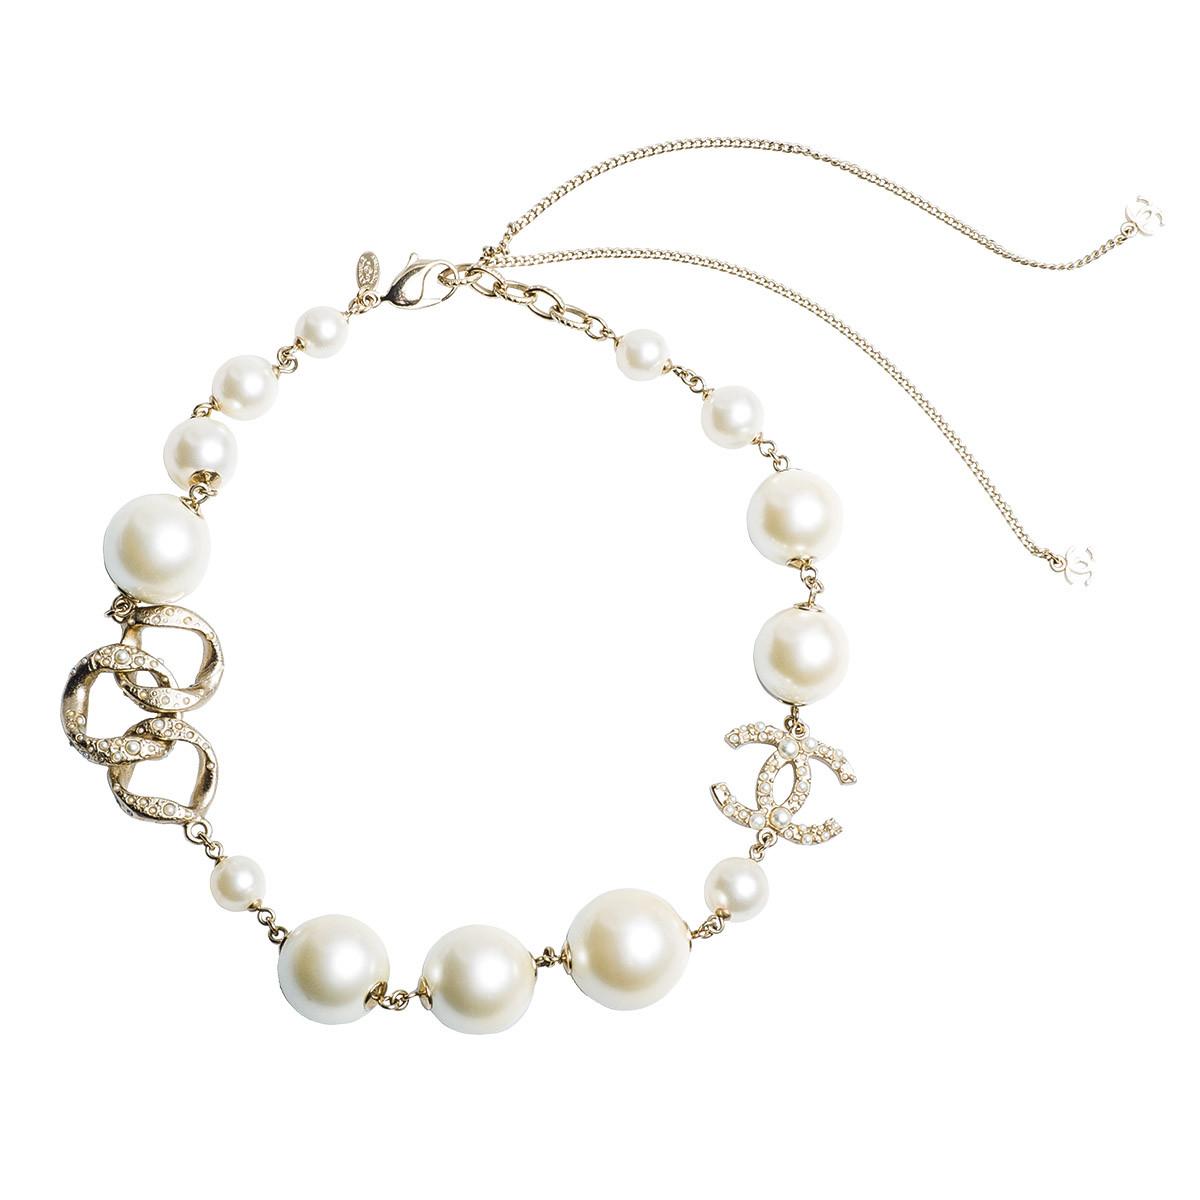 Vintage Chanel Large Faux Pearl Necklace